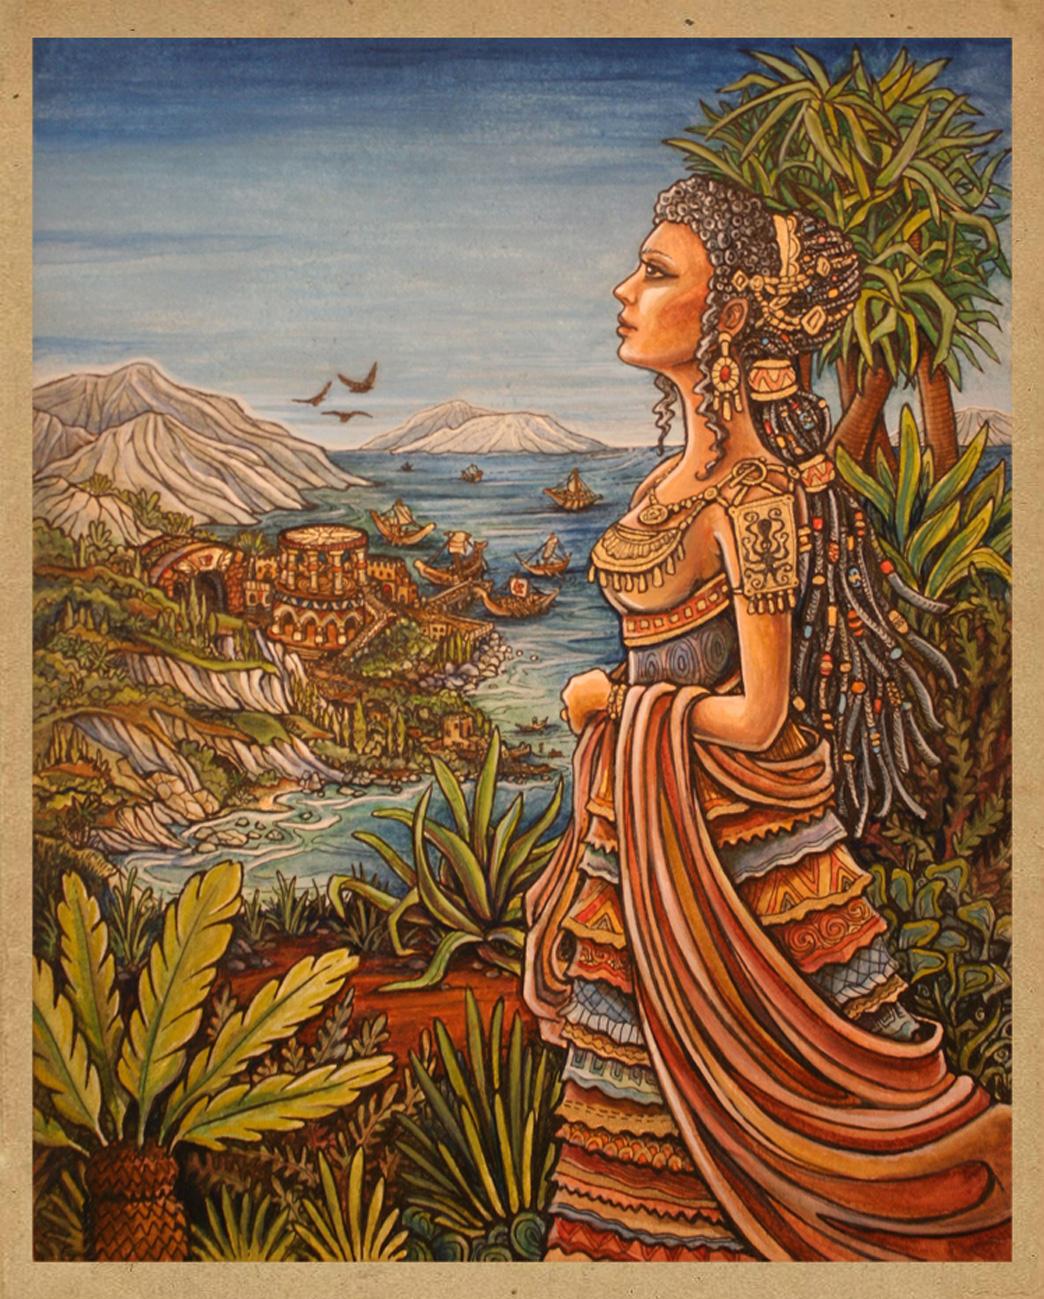 Minoan Woman historical fashion Illustration.